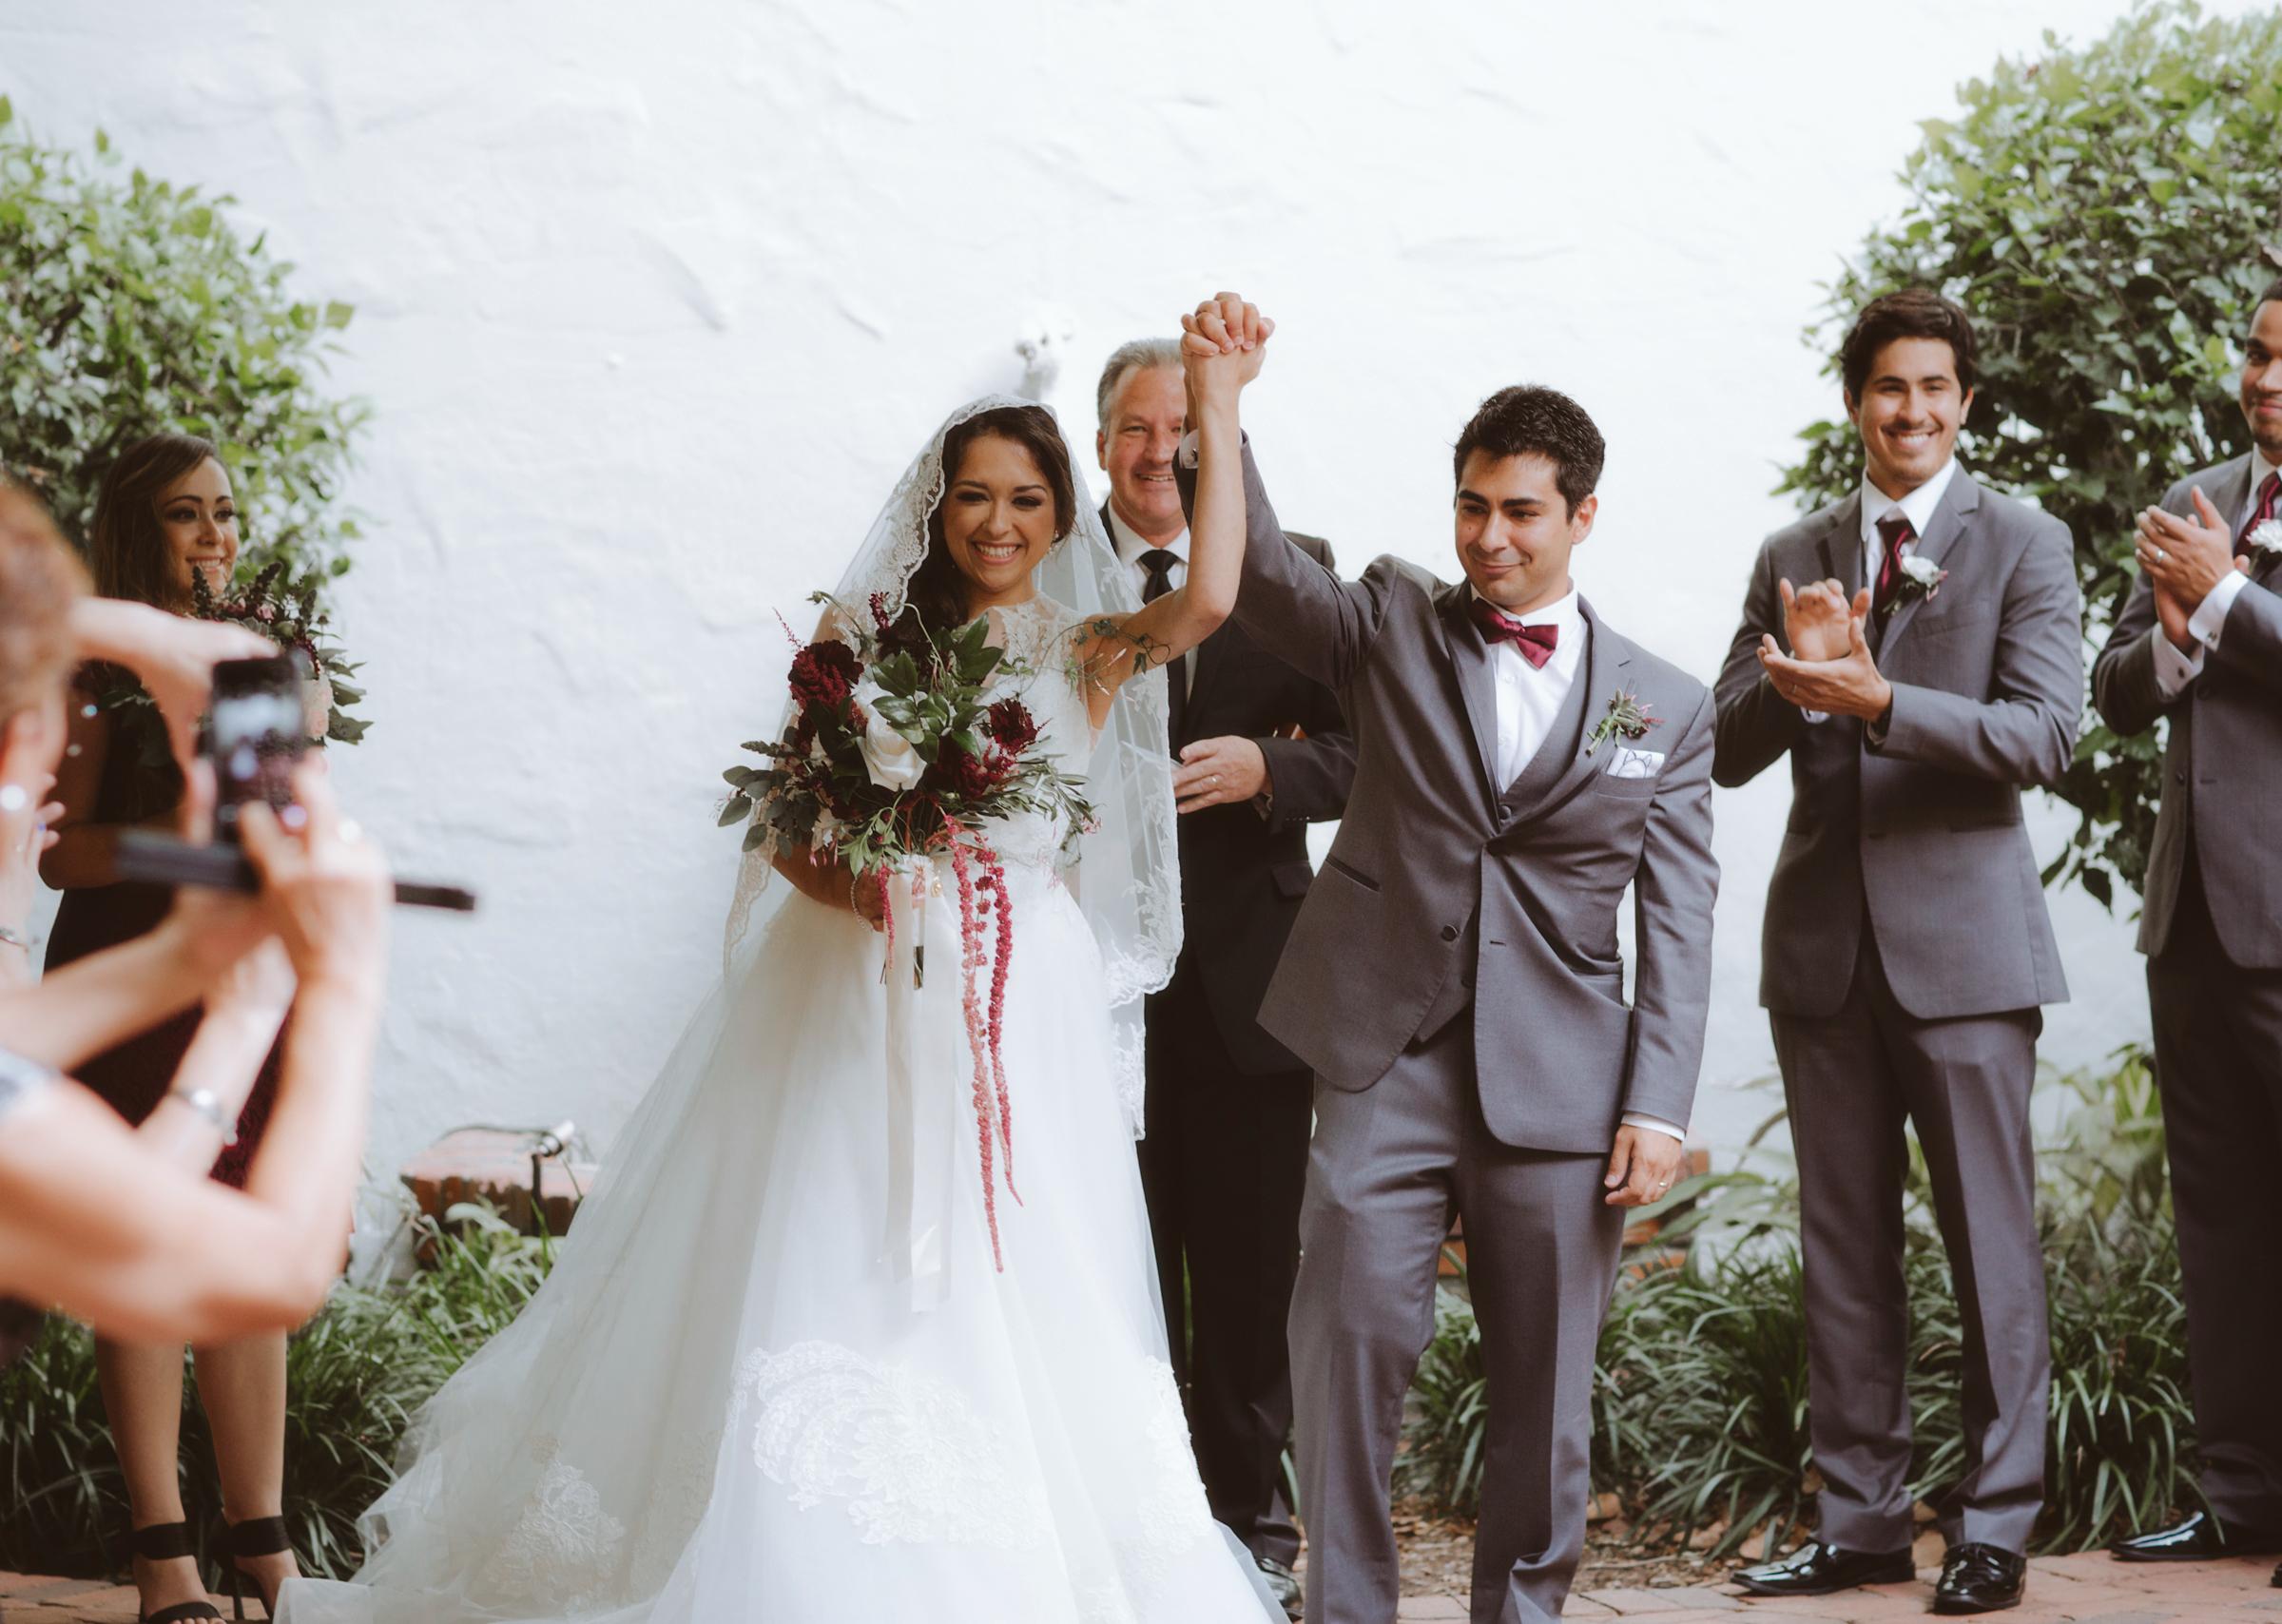 wedding day | MFA St Pete | Vanessa Boy Photography | vanessaboy.com-384.com |final.jpg